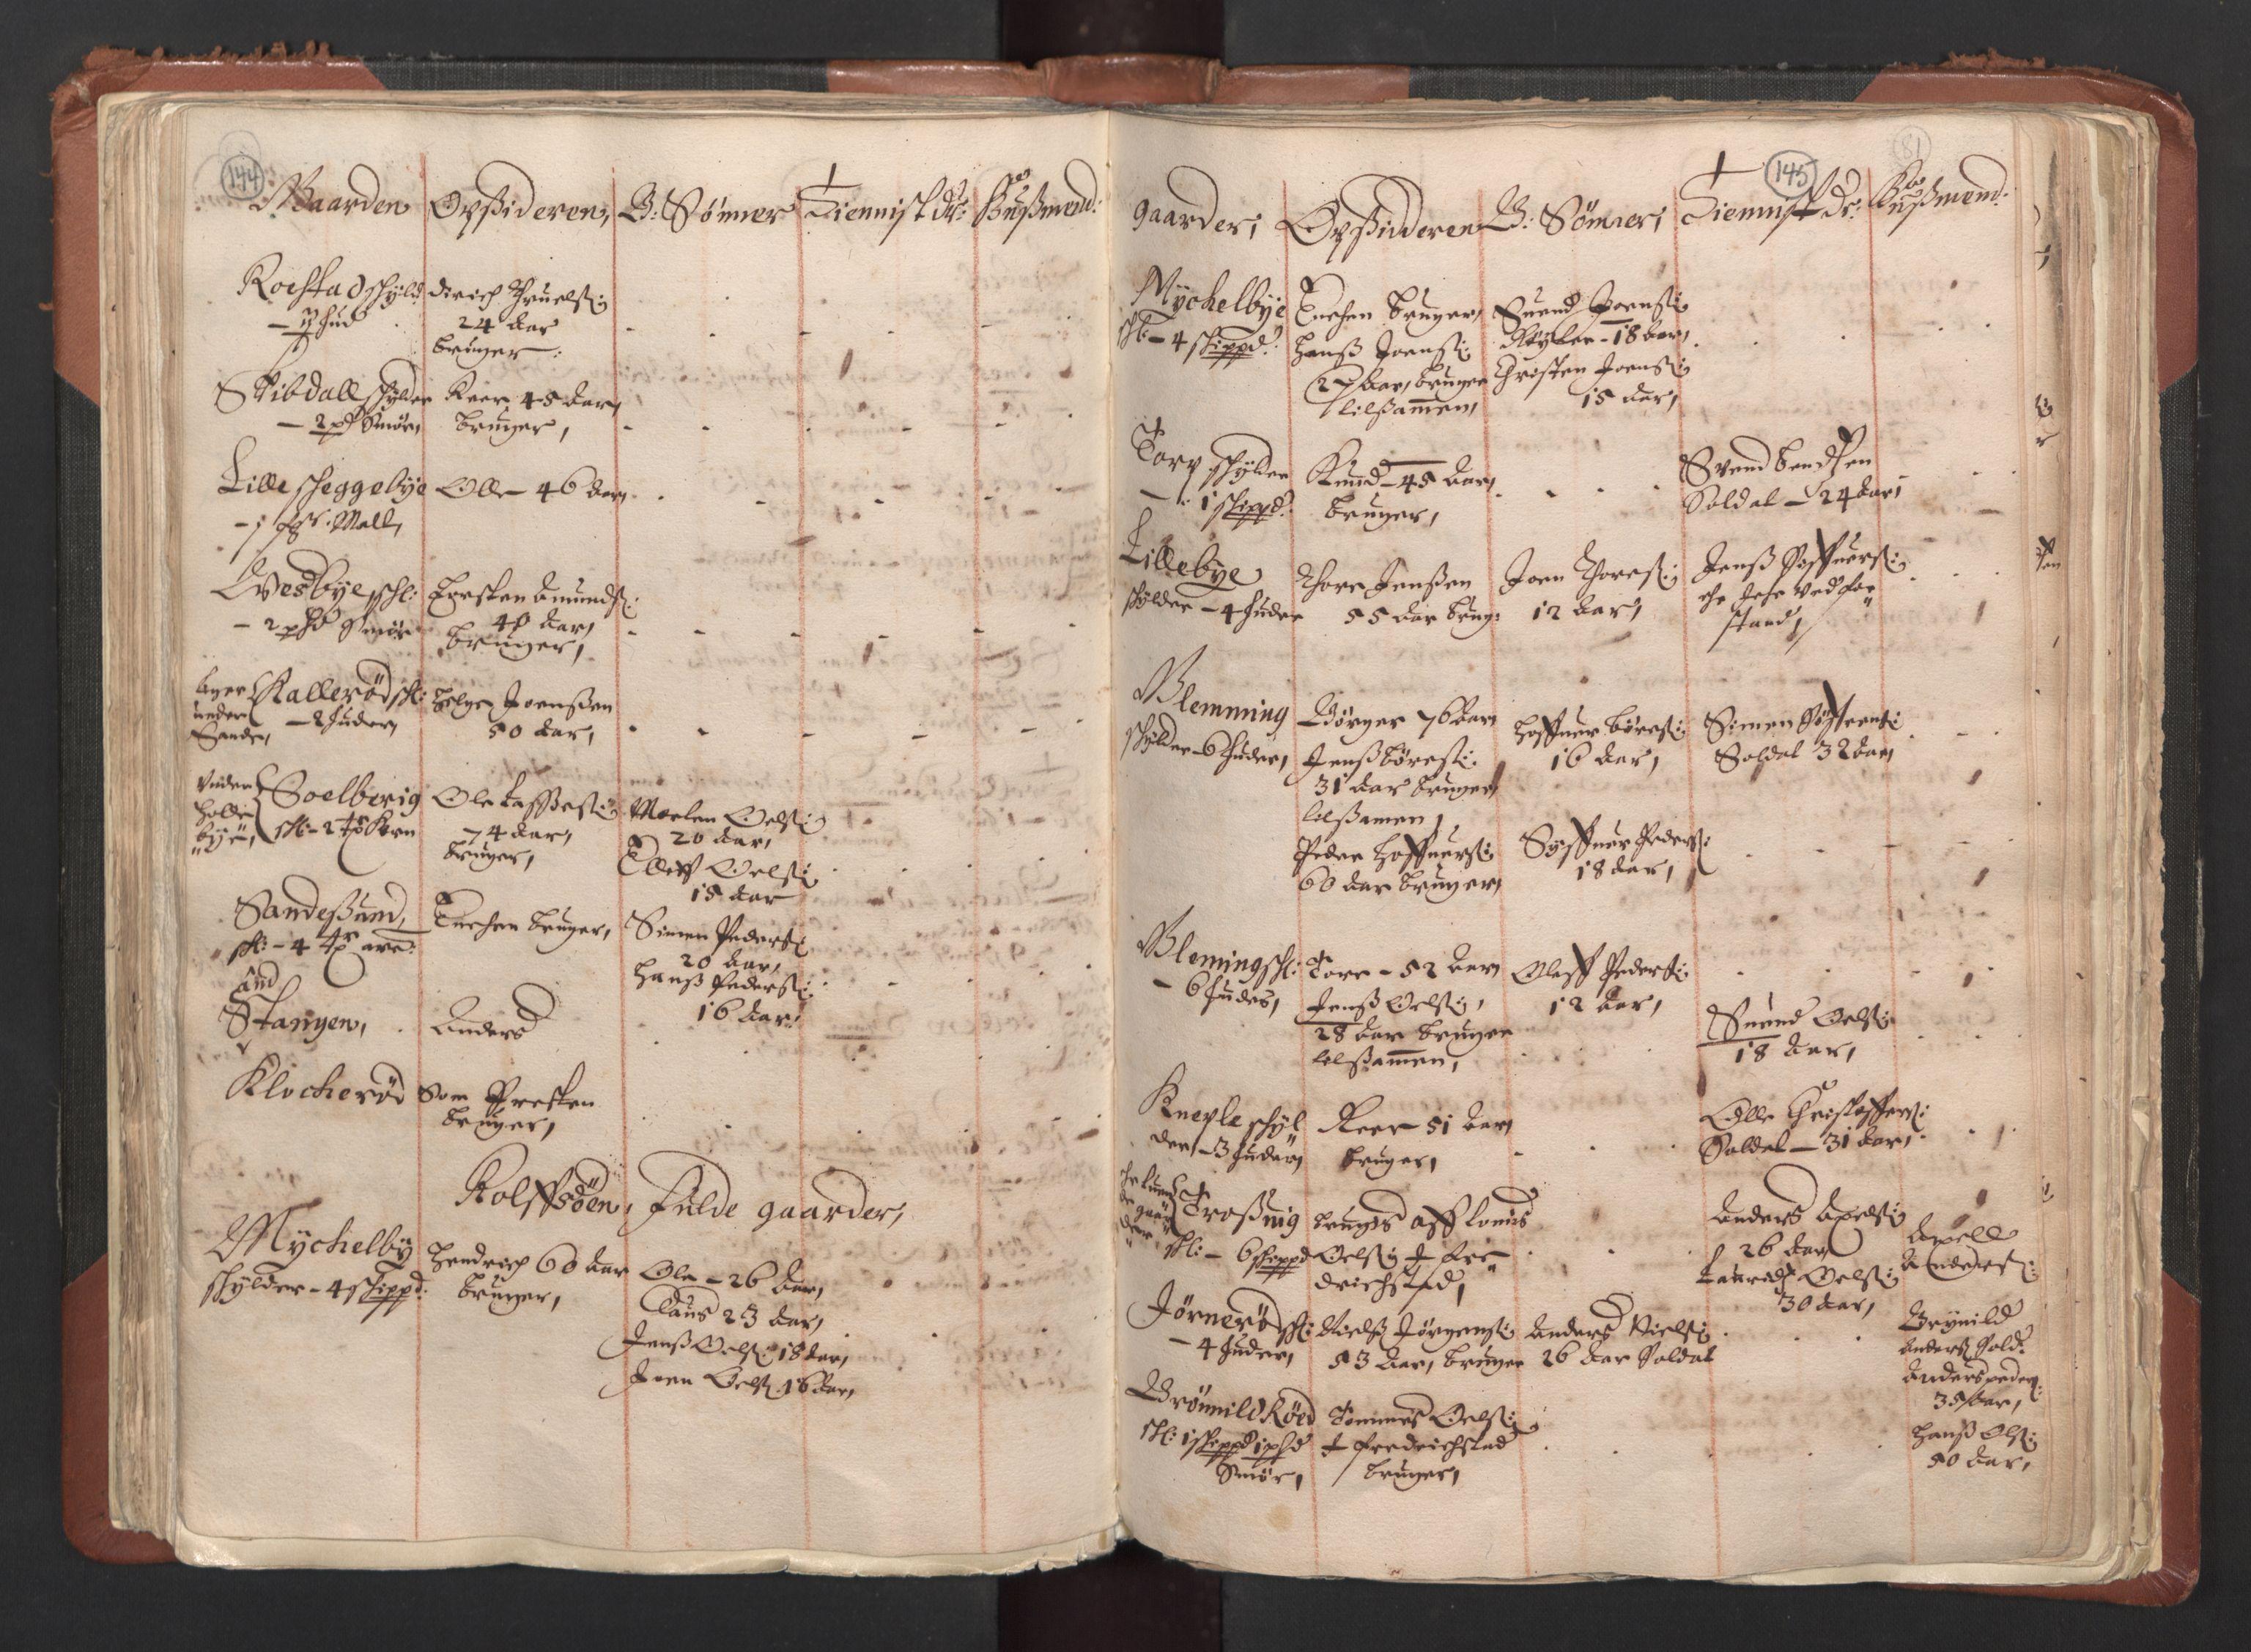 RA, Fogdenes og sorenskrivernes manntall 1664-1666, nr. 1: Fogderier (len og skipreider) i nåværende Østfold fylke, 1664, s. 144-145